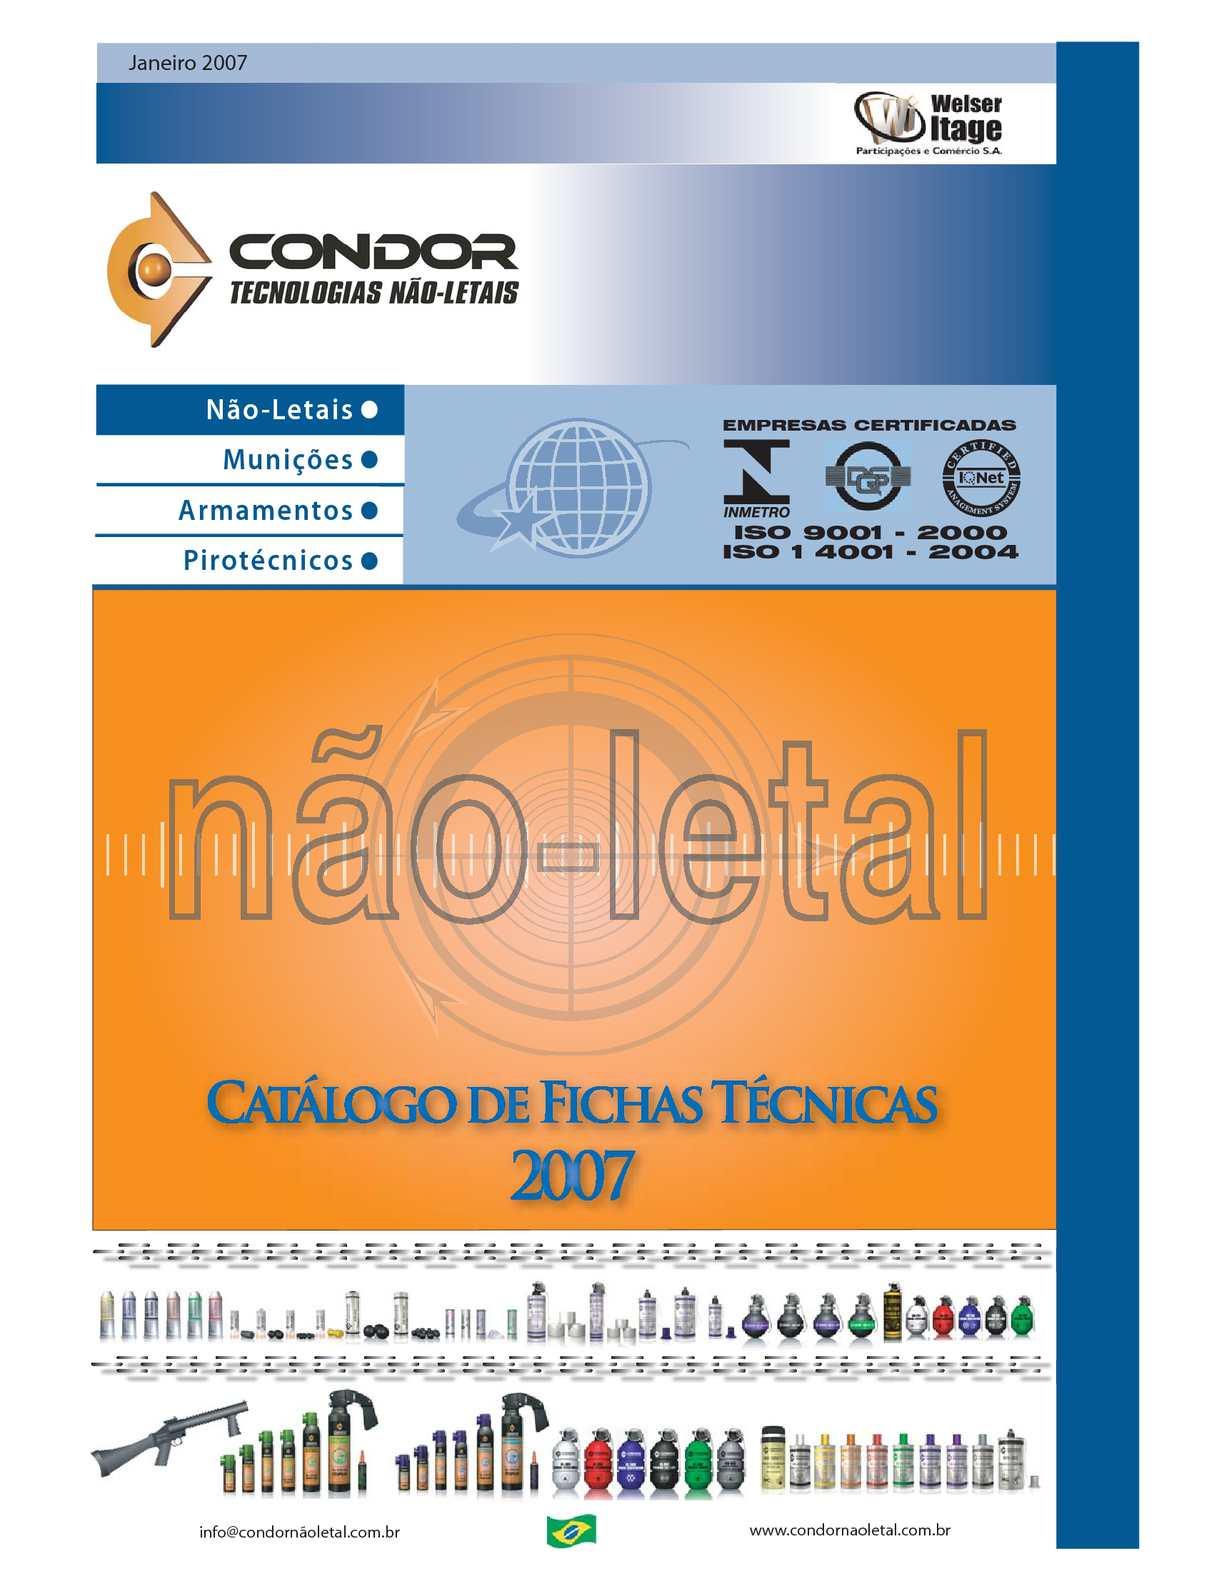 4. Catalogo de Fichas Técnicas de Condor